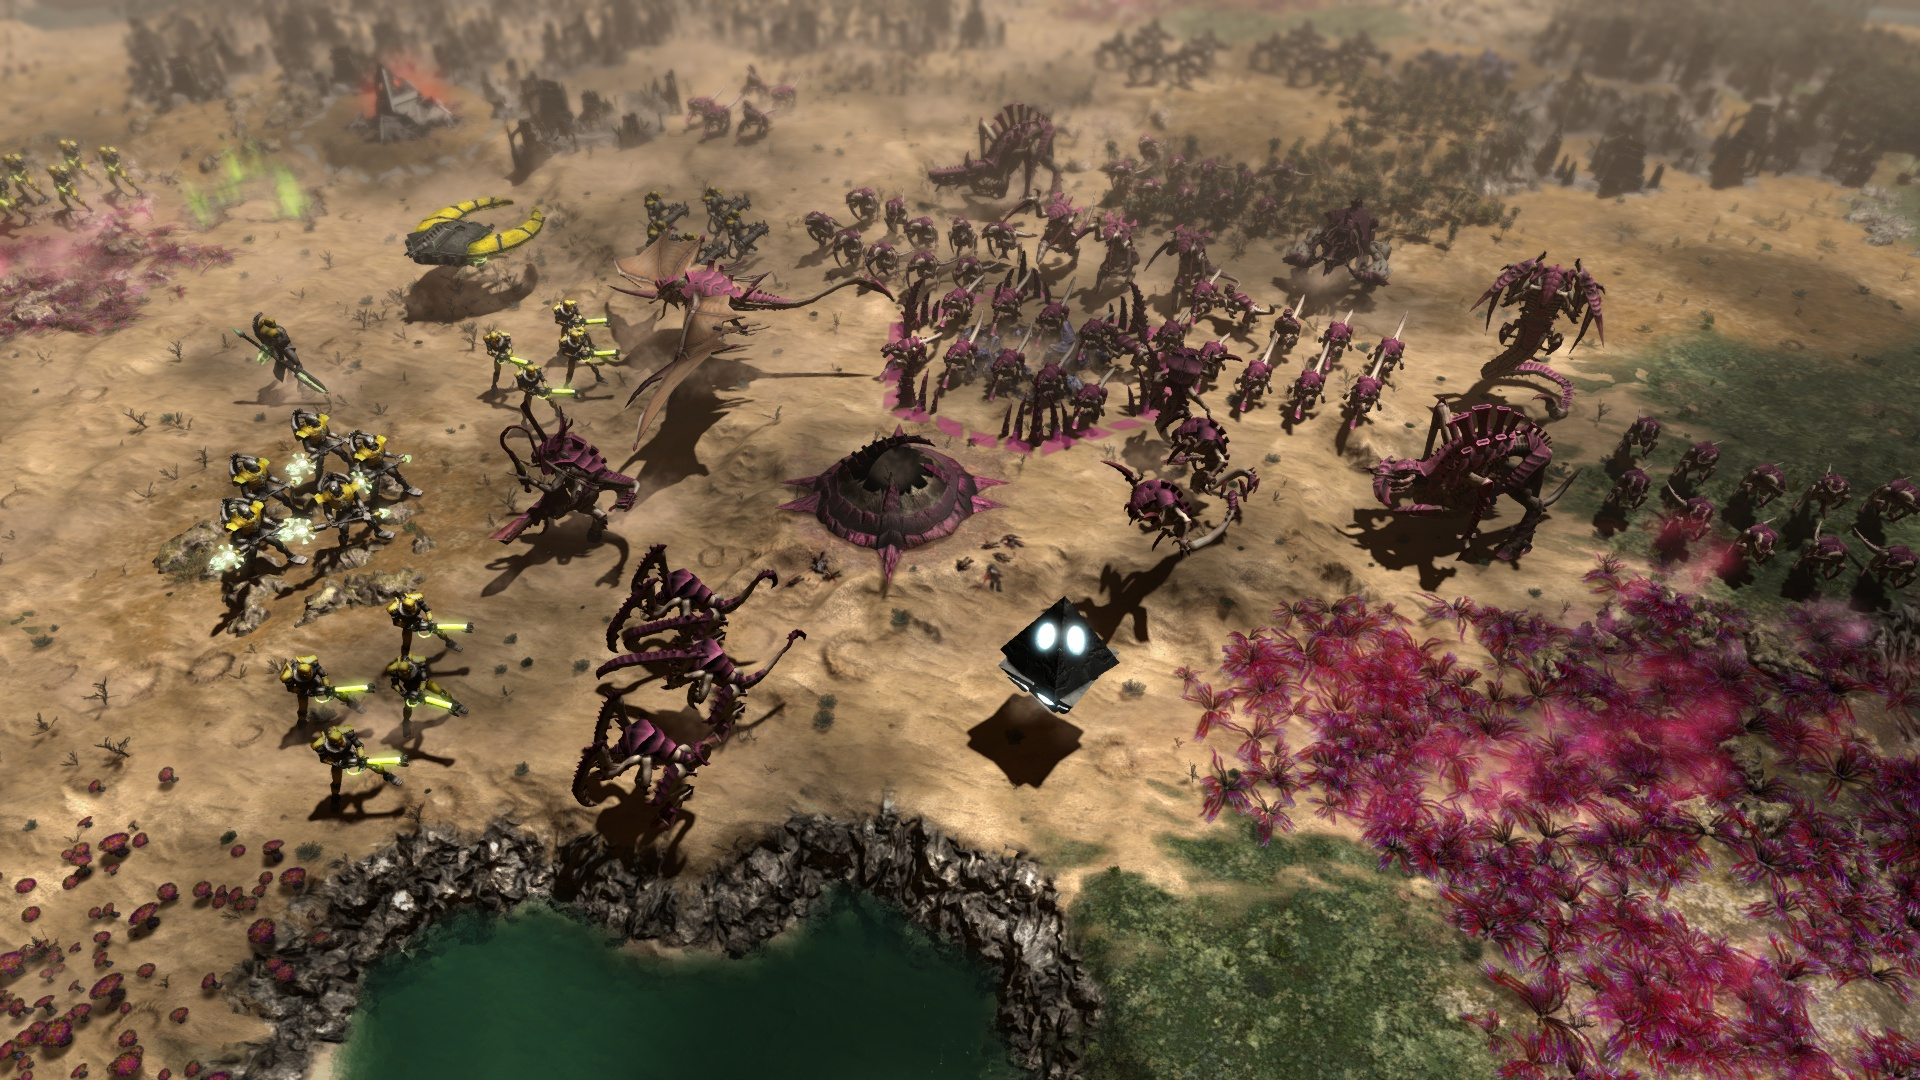 All-devouring Tyranid swarms arrive in Warhammer 40k: Gladius this week